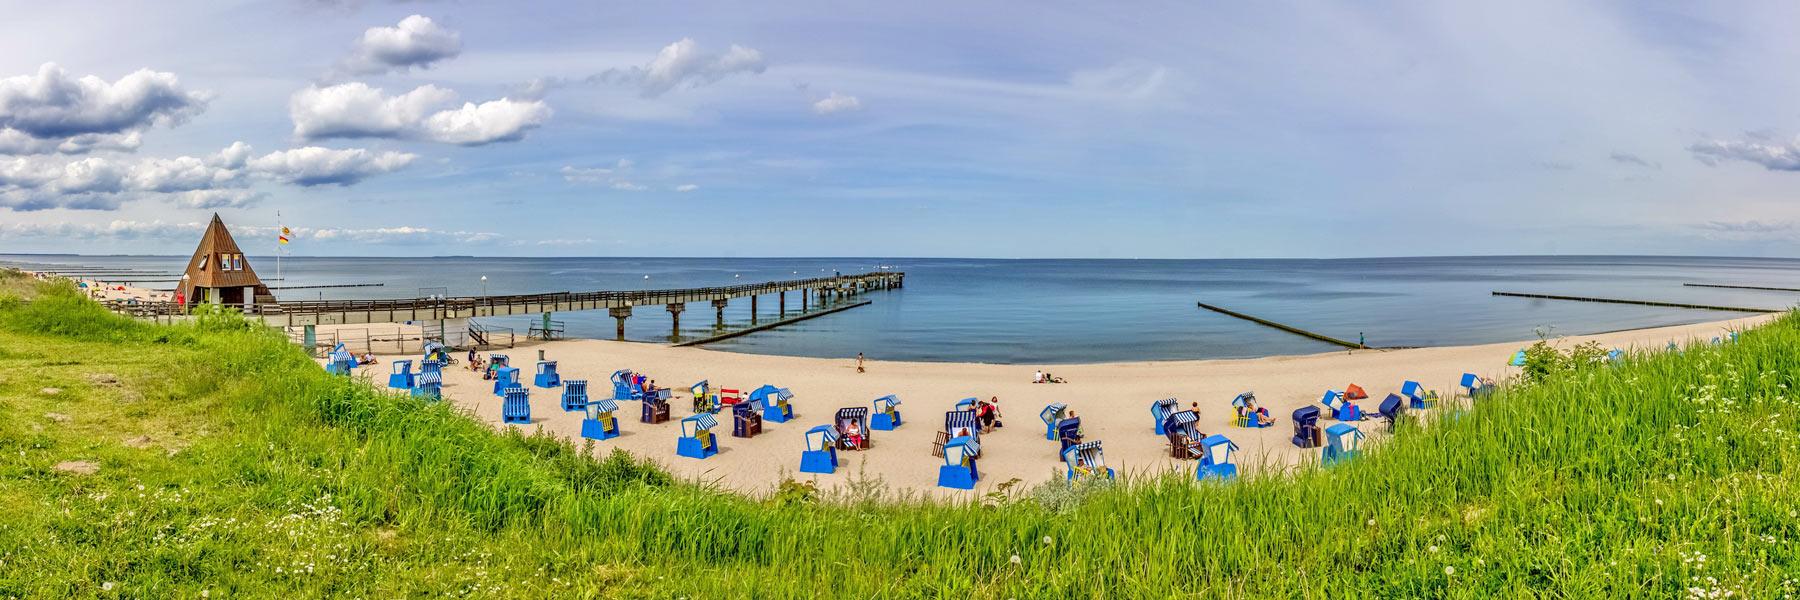 Strand Koserow - Insel Usedom